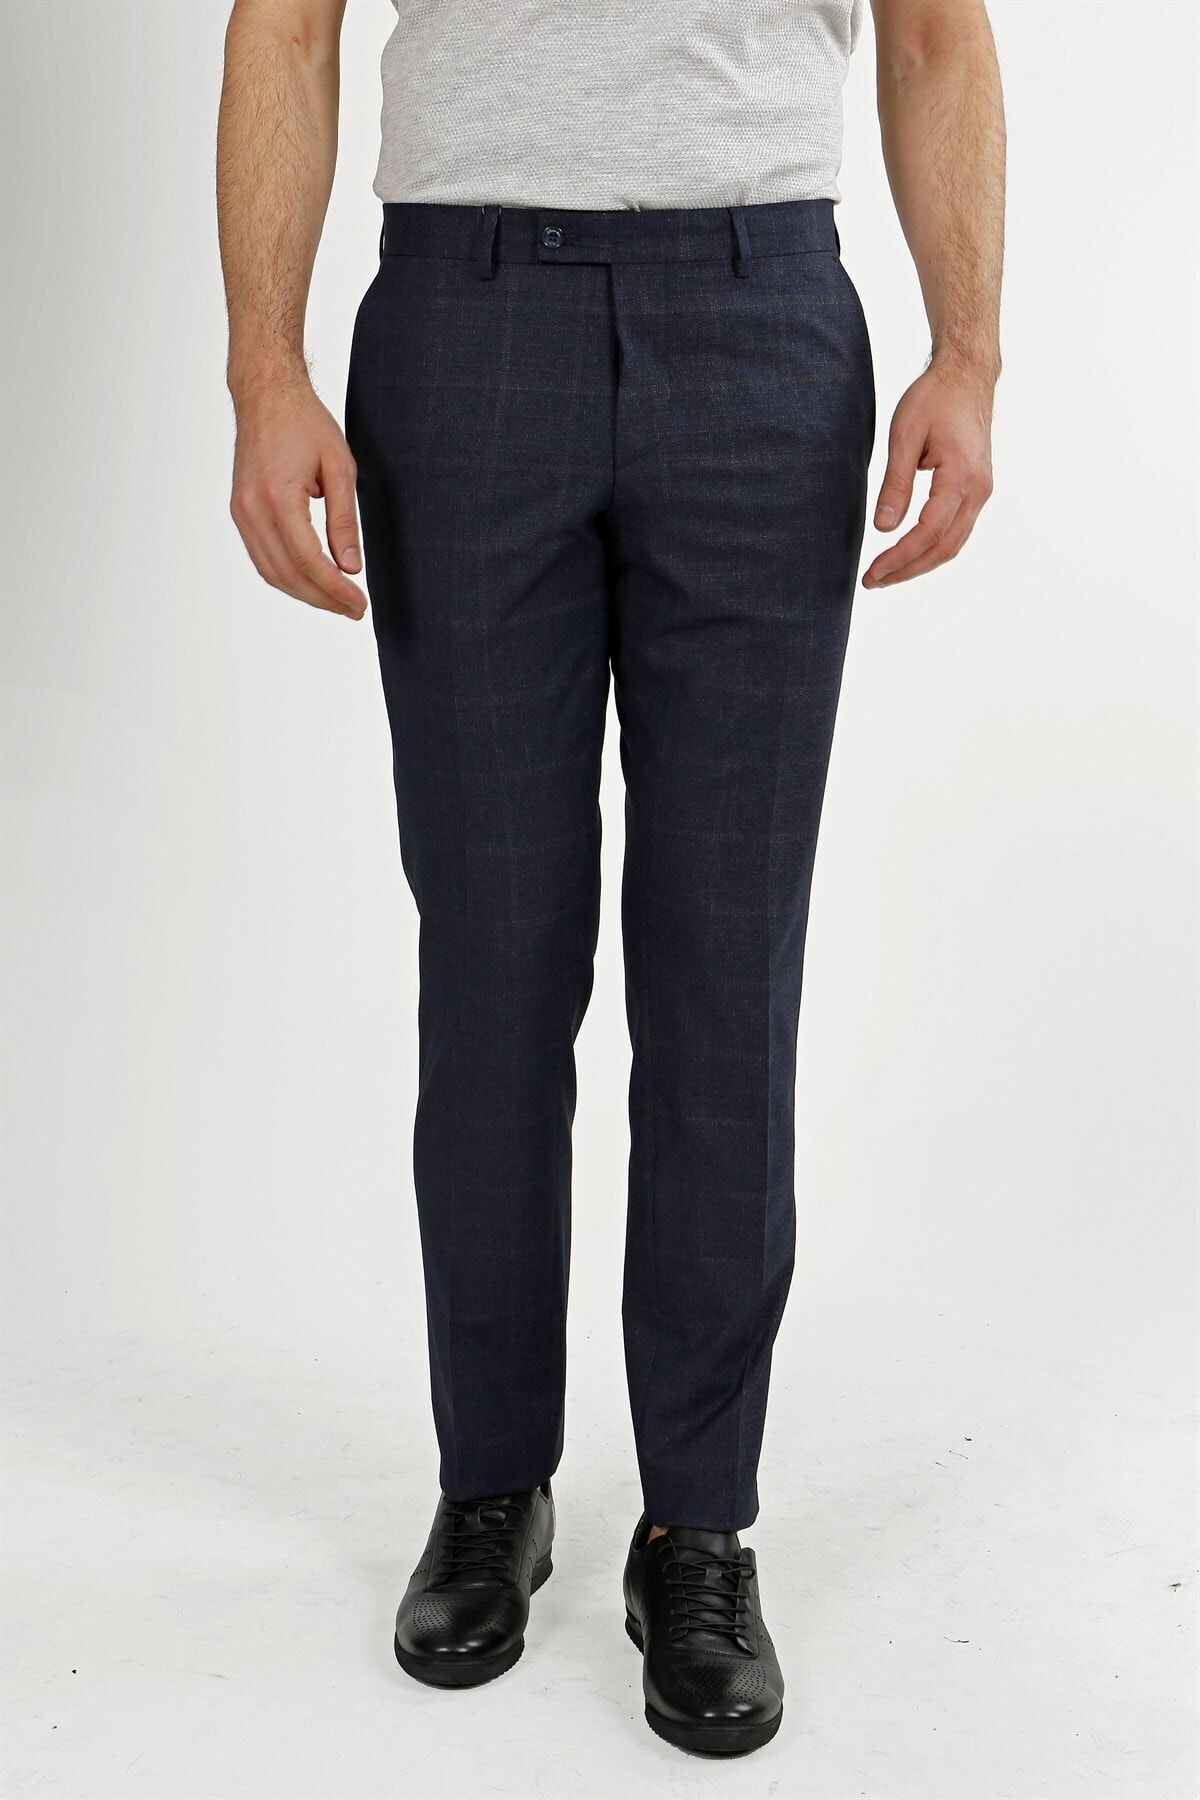 Jakamen Lacivert Klasik Kalıp - Regular Fit Pantolon- Yan Cep 1